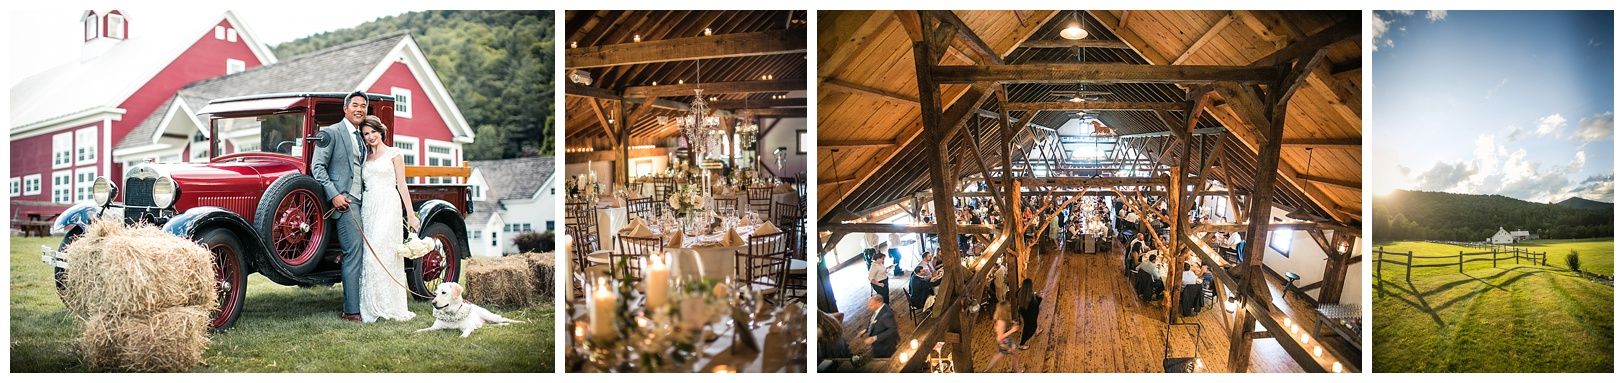 Riverside_Vermont_Wedding_Venue_0089